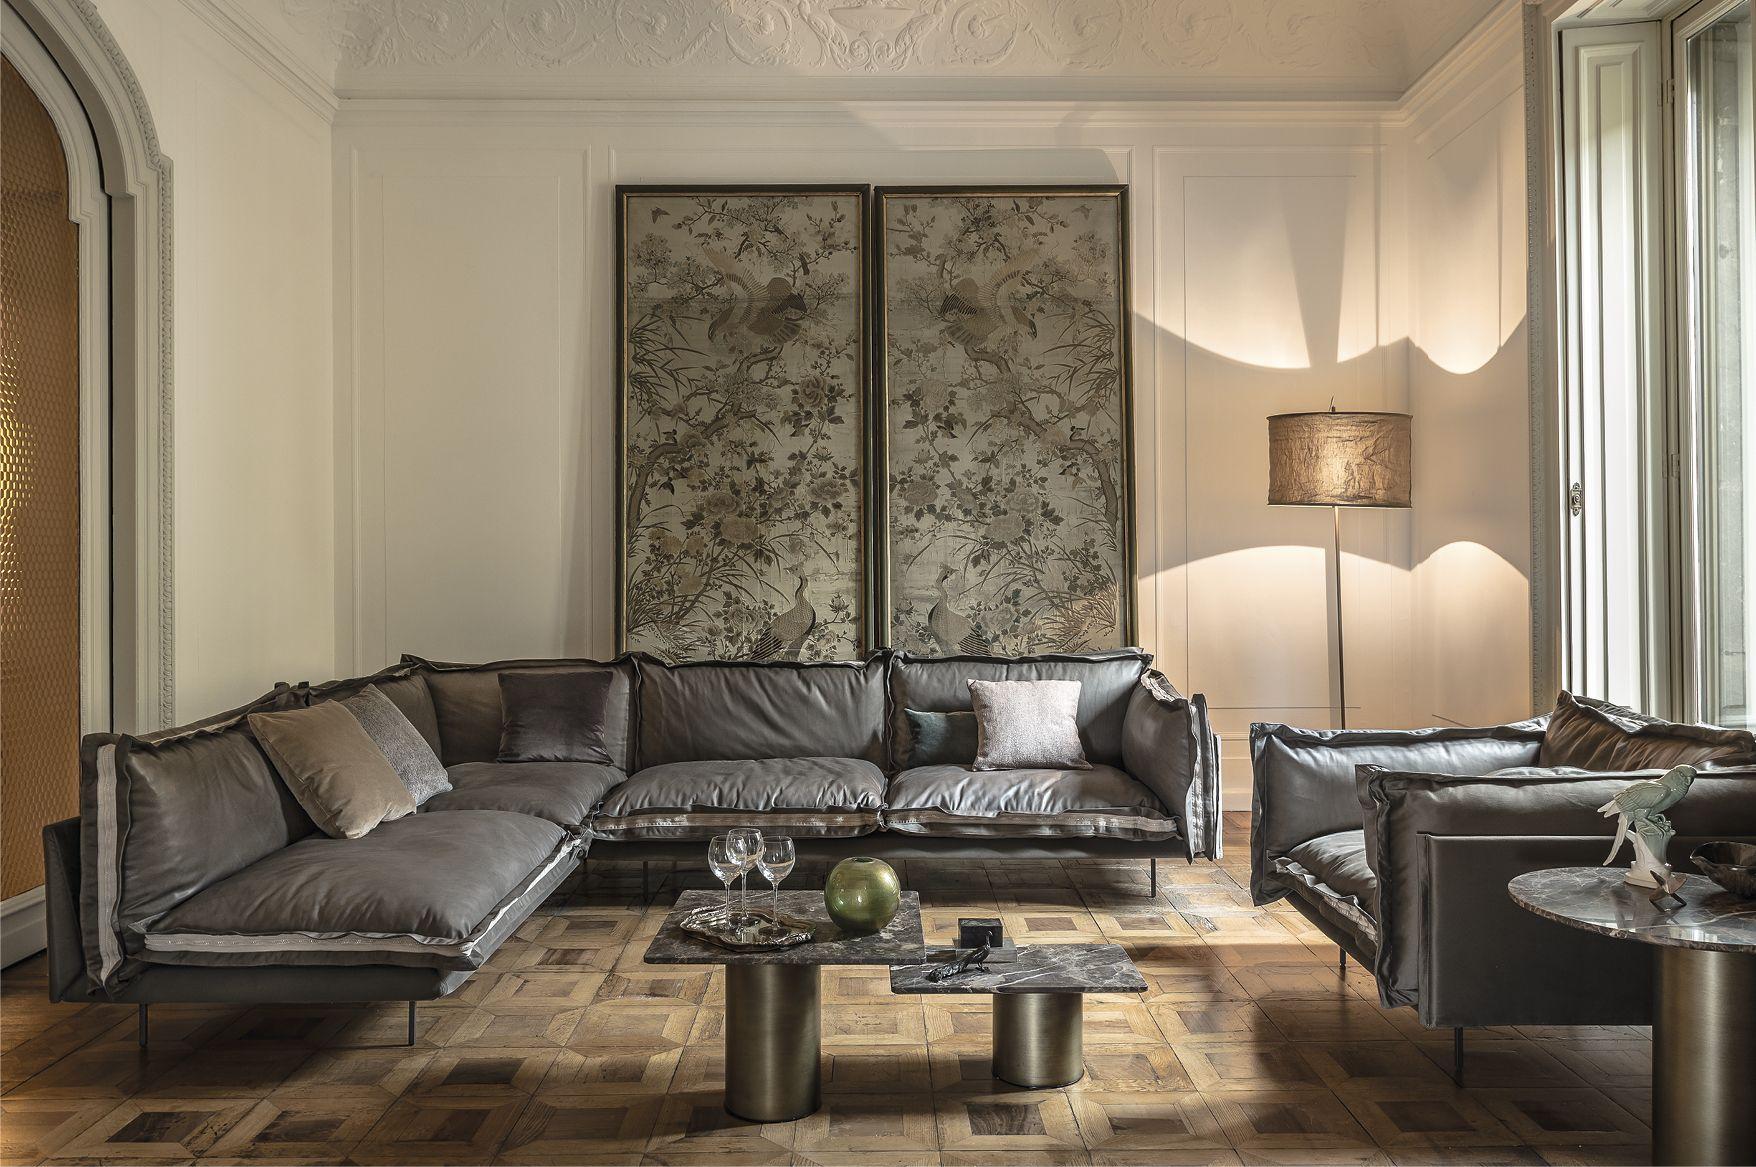 Autoreverse by Arketipo sofá interiorismo en Duh art Design